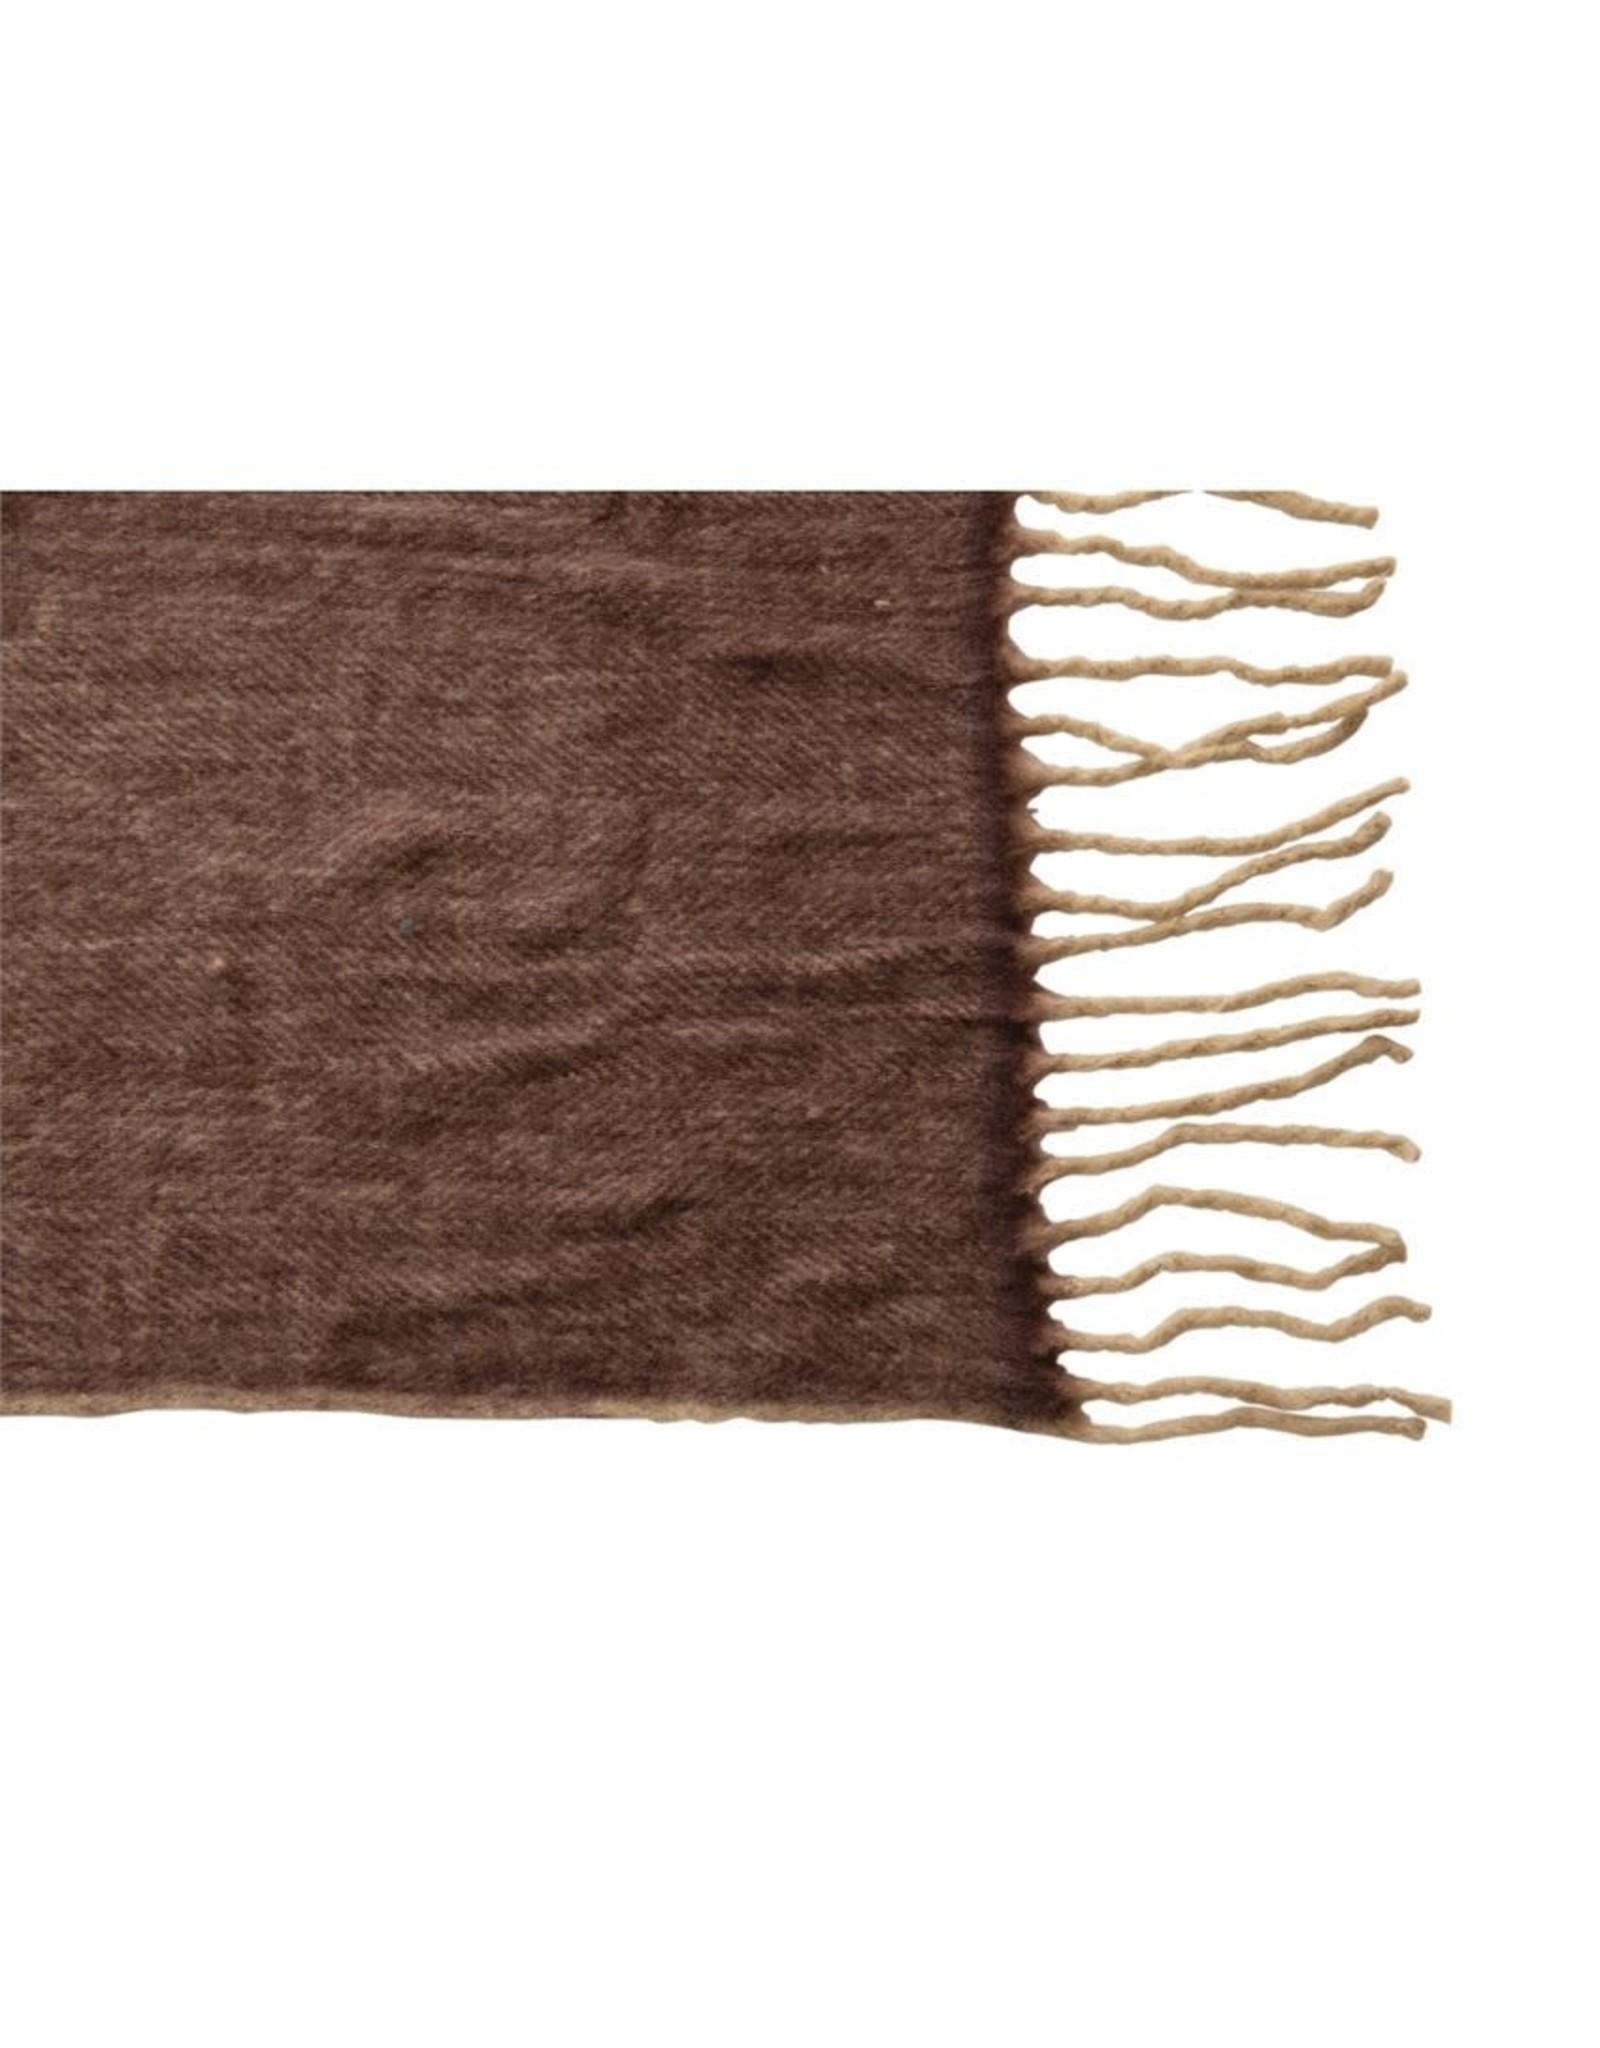 The Florist & The Merchant Wool & Acrylic Throw w/ Fringe - Plum